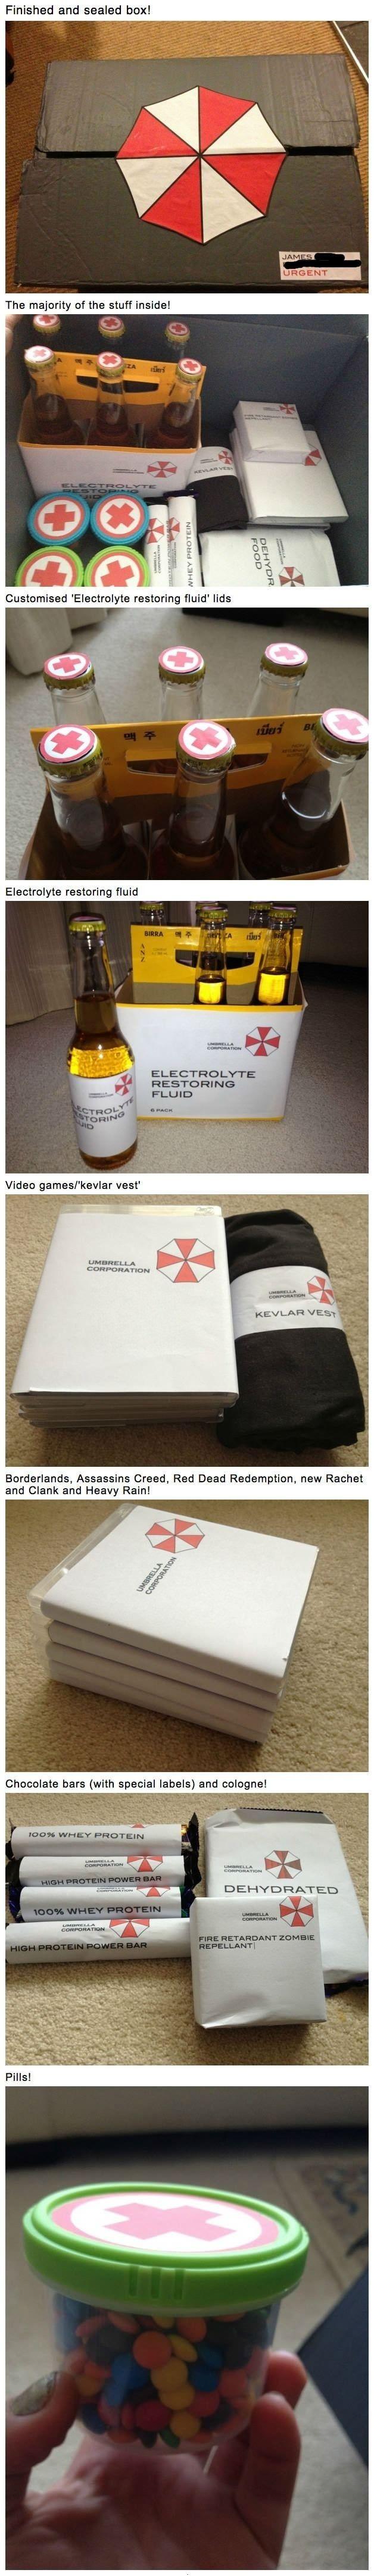 Homemade Zombie Survival Kit